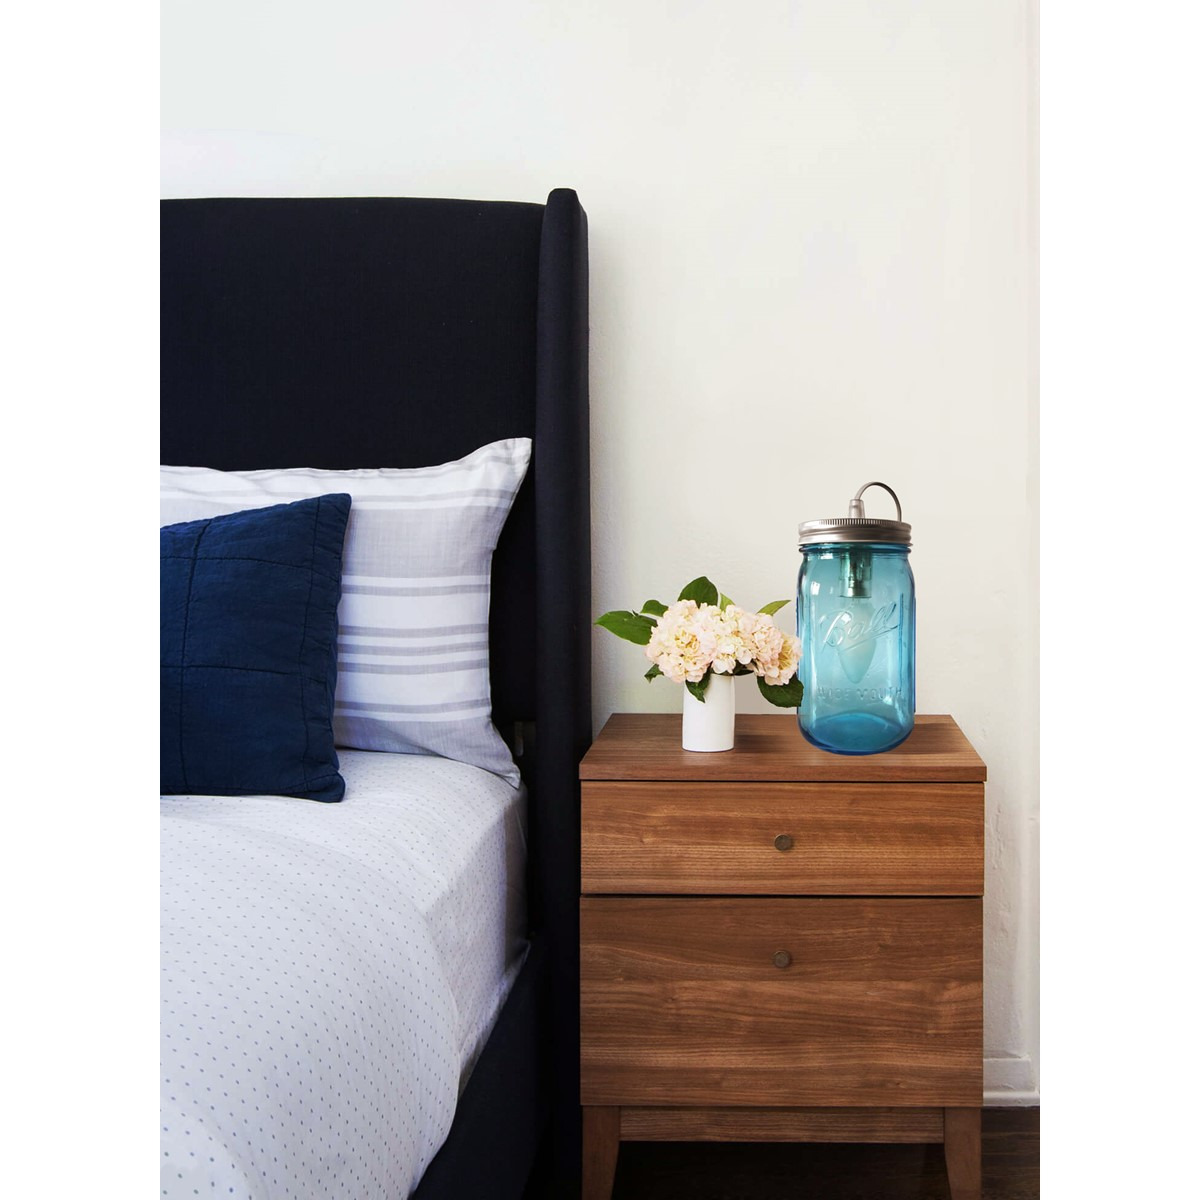 Lampe bocal en verre bleu clair